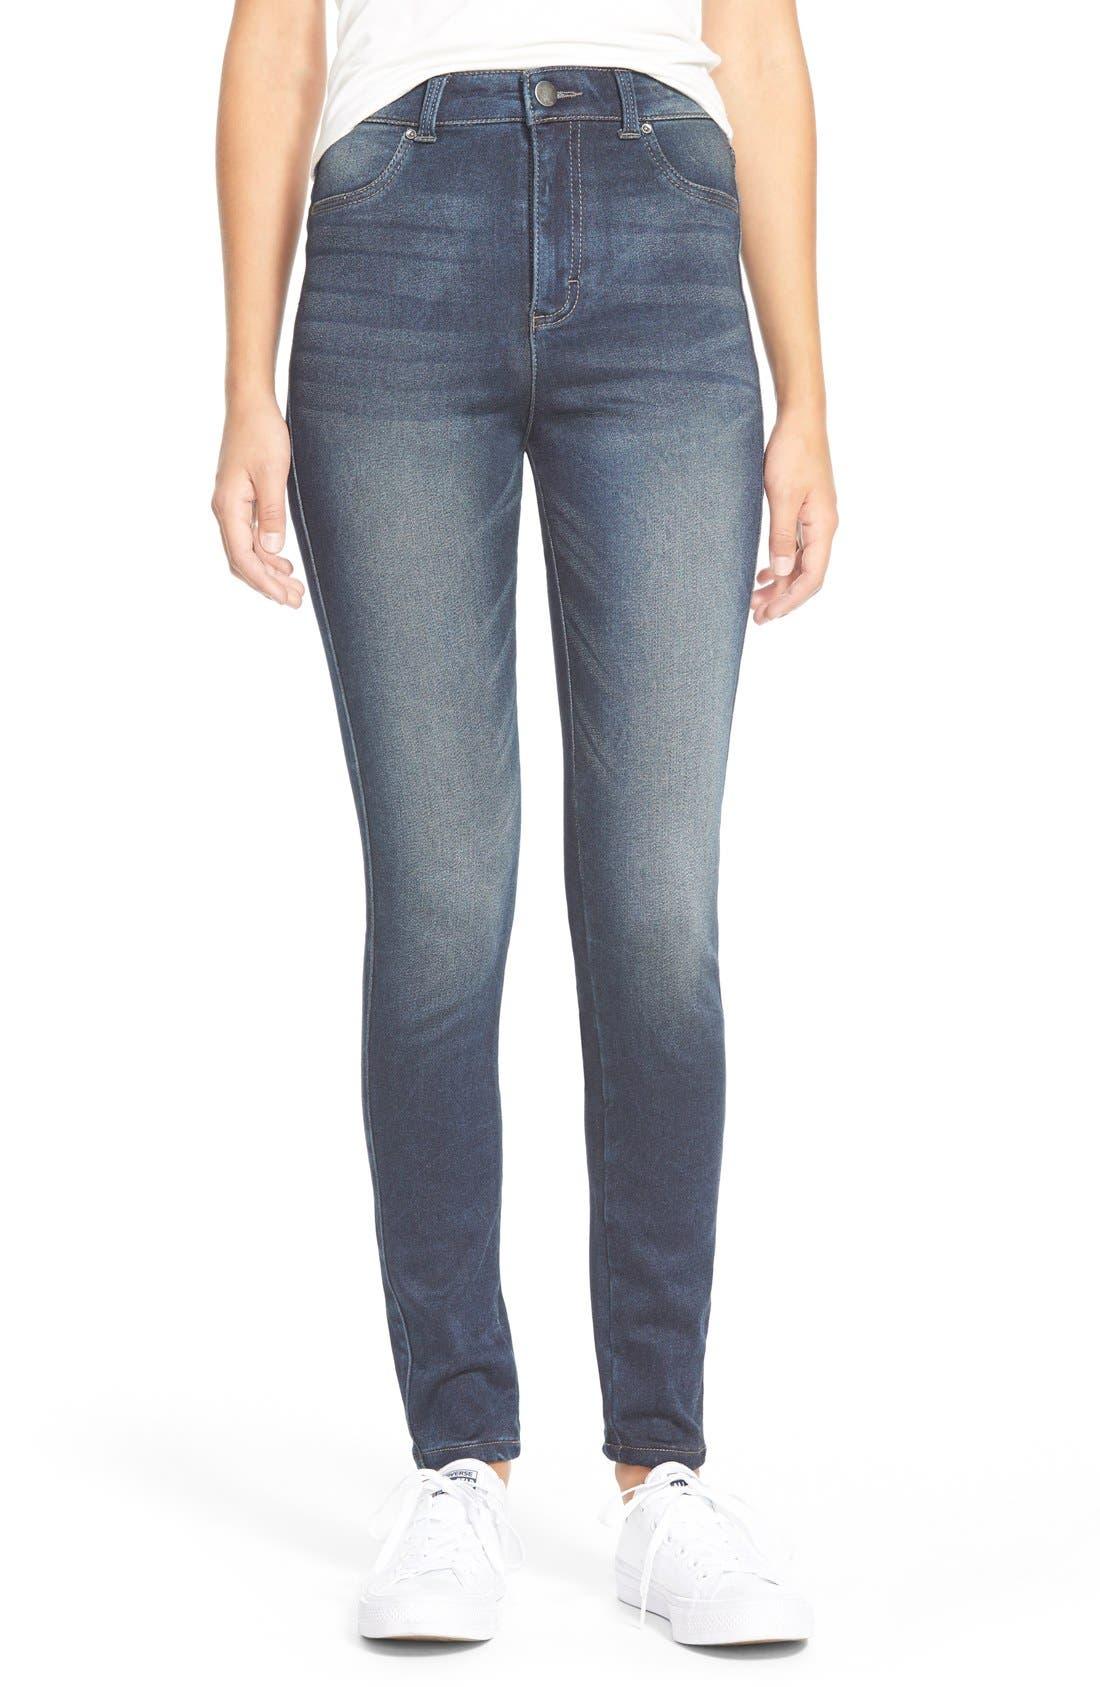 Main Image - Generra High Waist Skinny Jeans